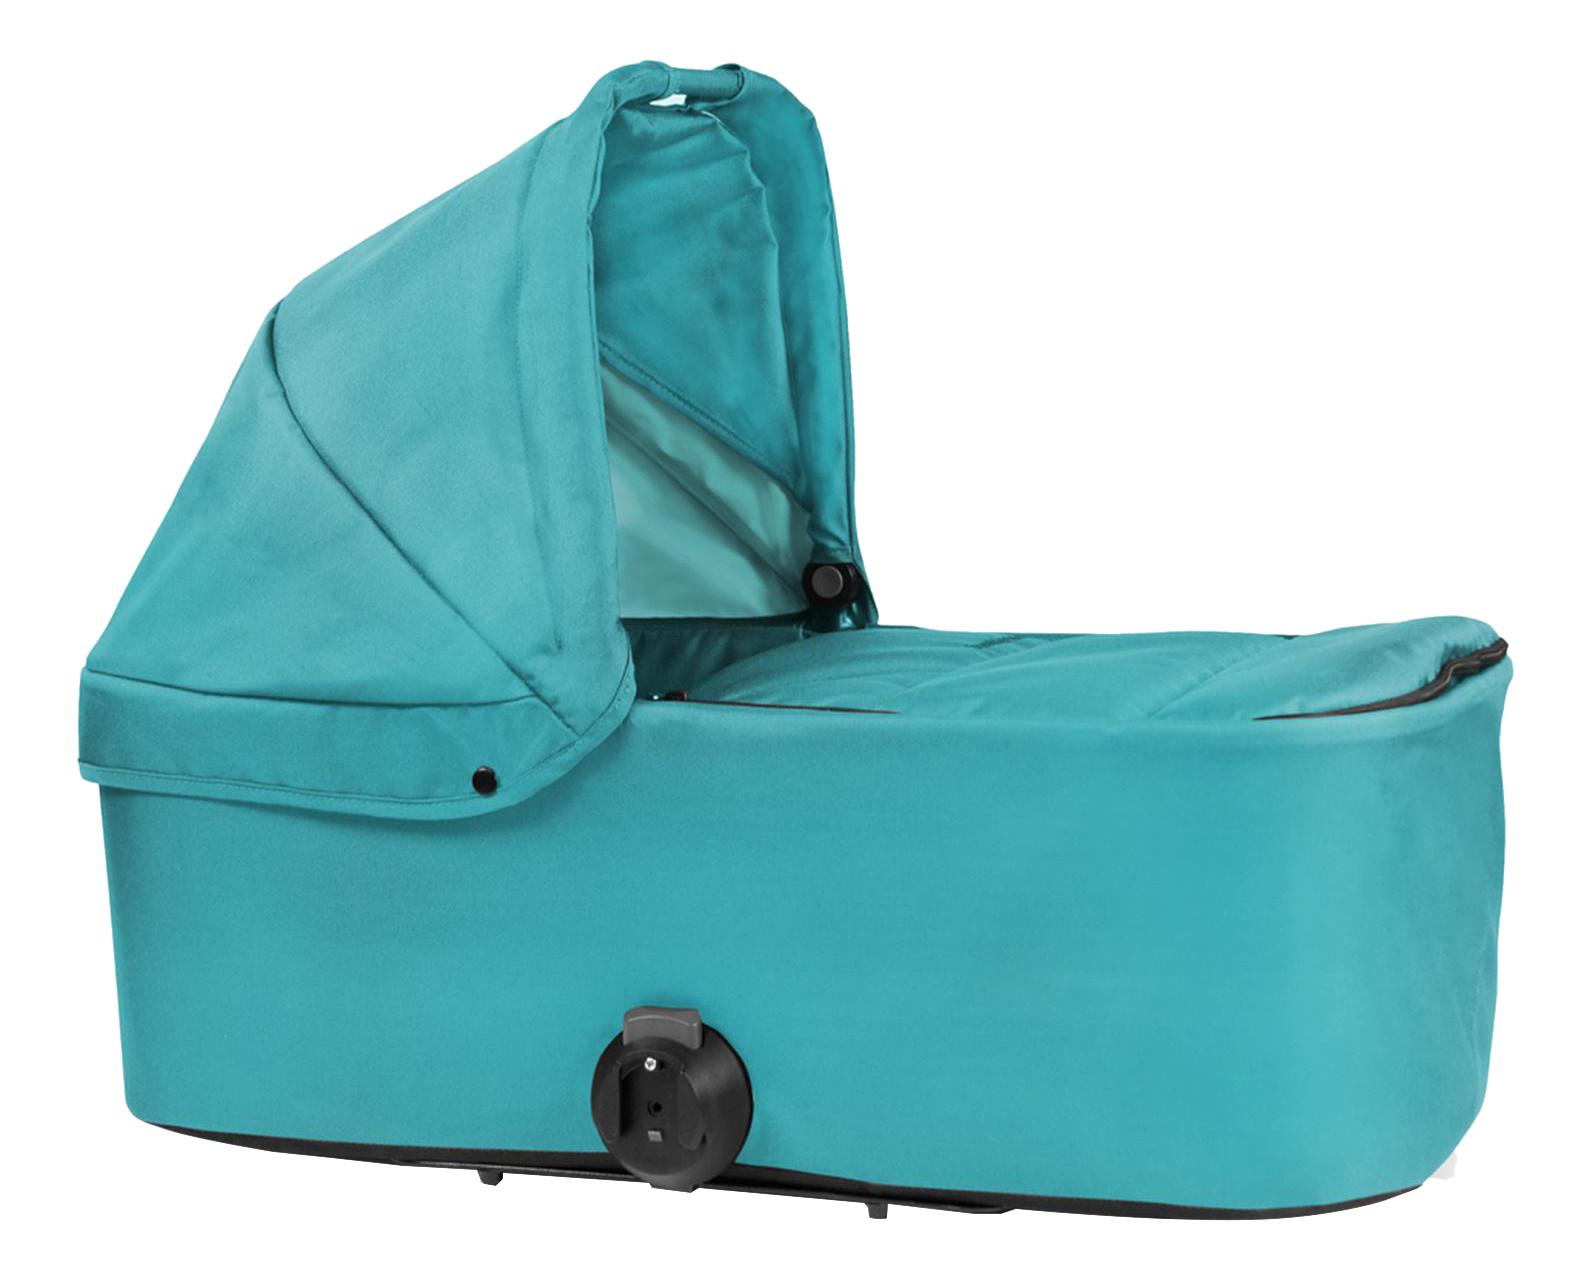 Купить Carrycot Tourmaline для Indie & Speed, Люлька Bumbleride Carrycot Tourmaline для Indie and Speed,